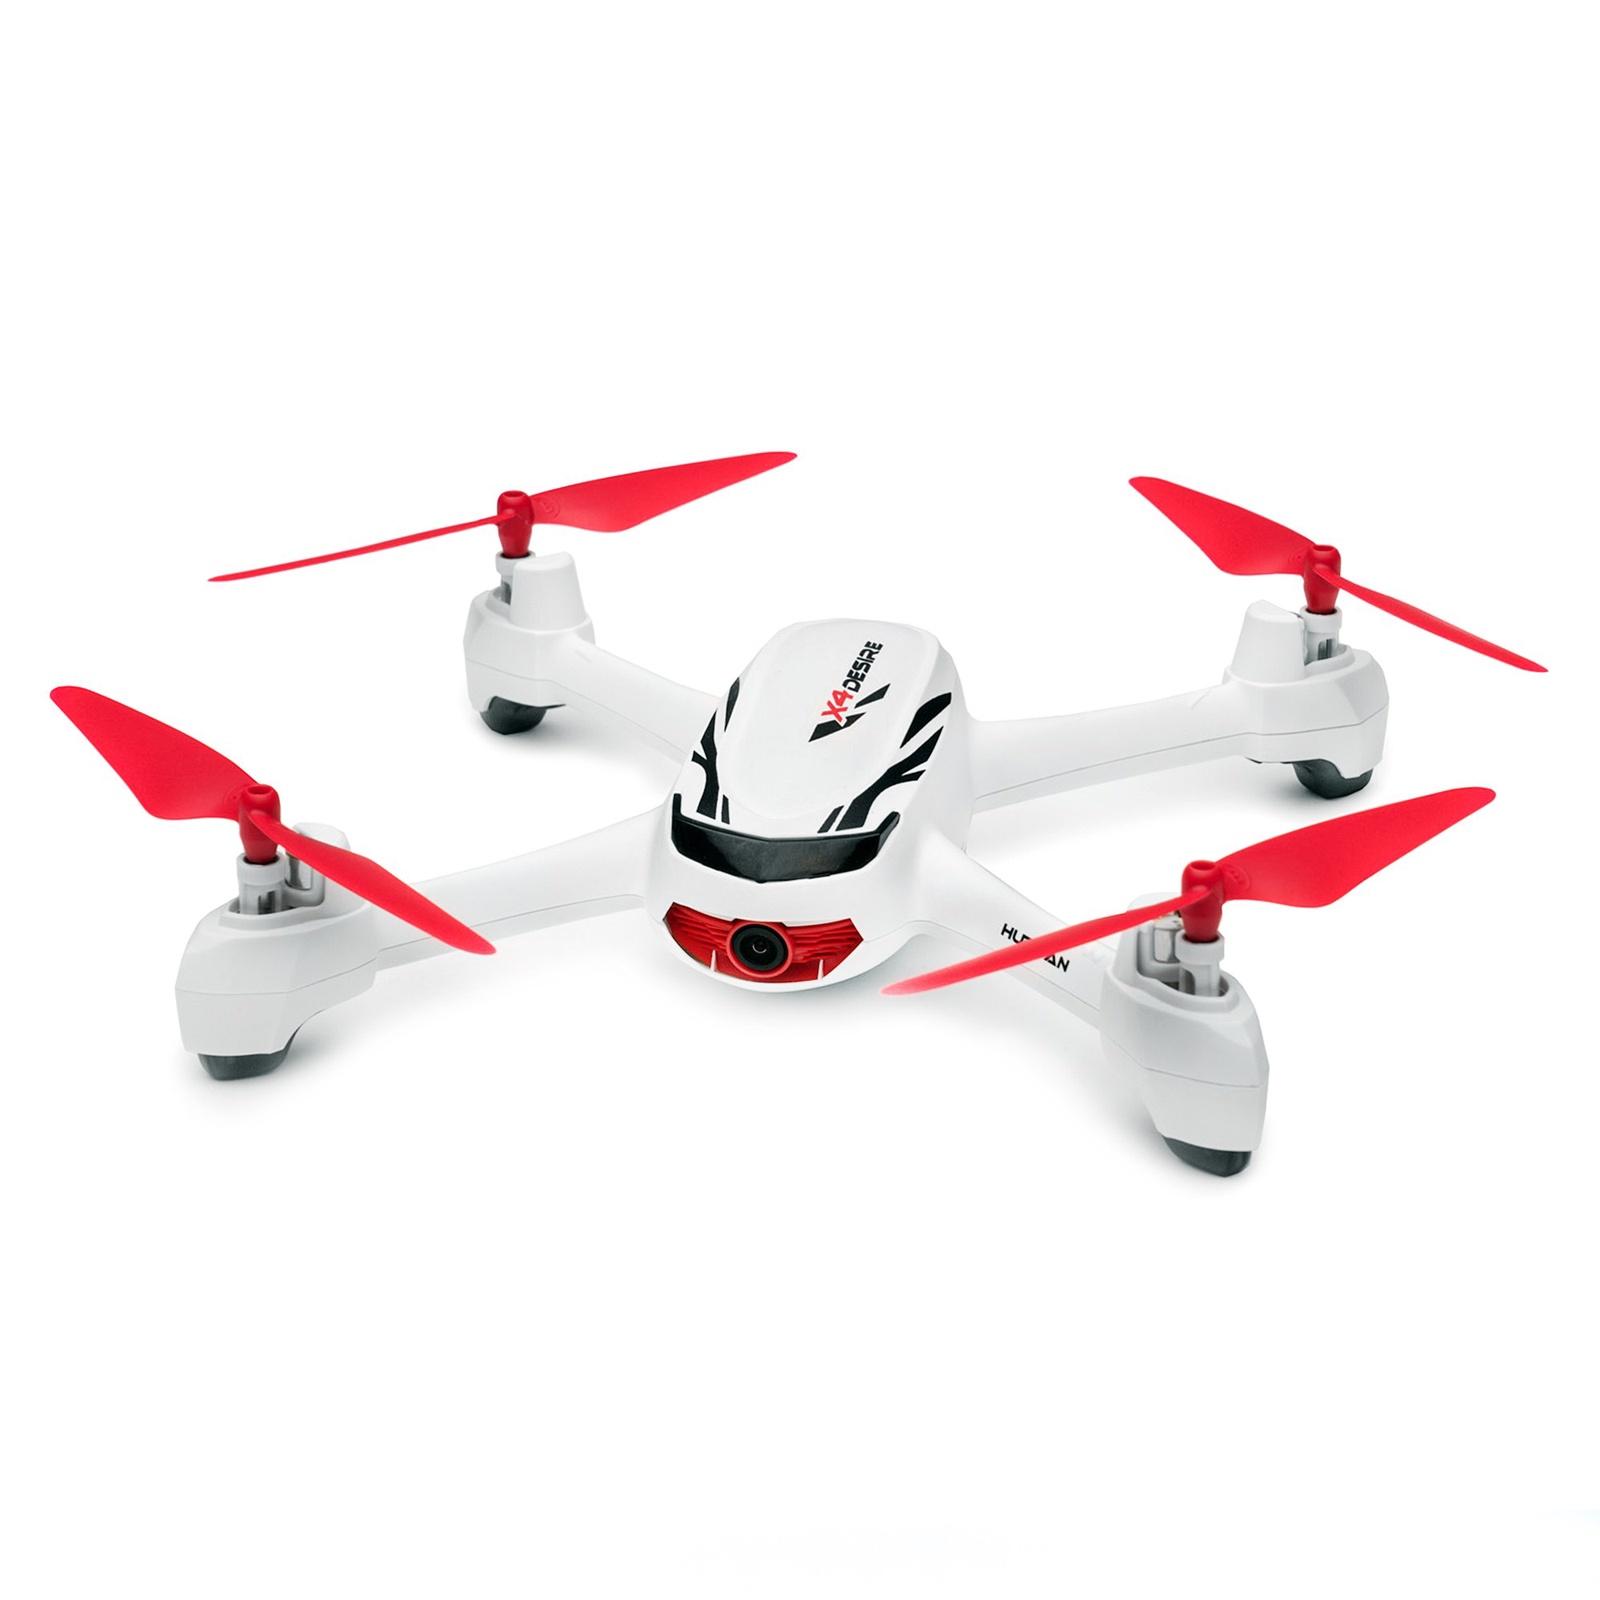 Квадрокоптер Hubsan X4 H502E hubsan x4 h502s h502e 2 4g rx receiver board